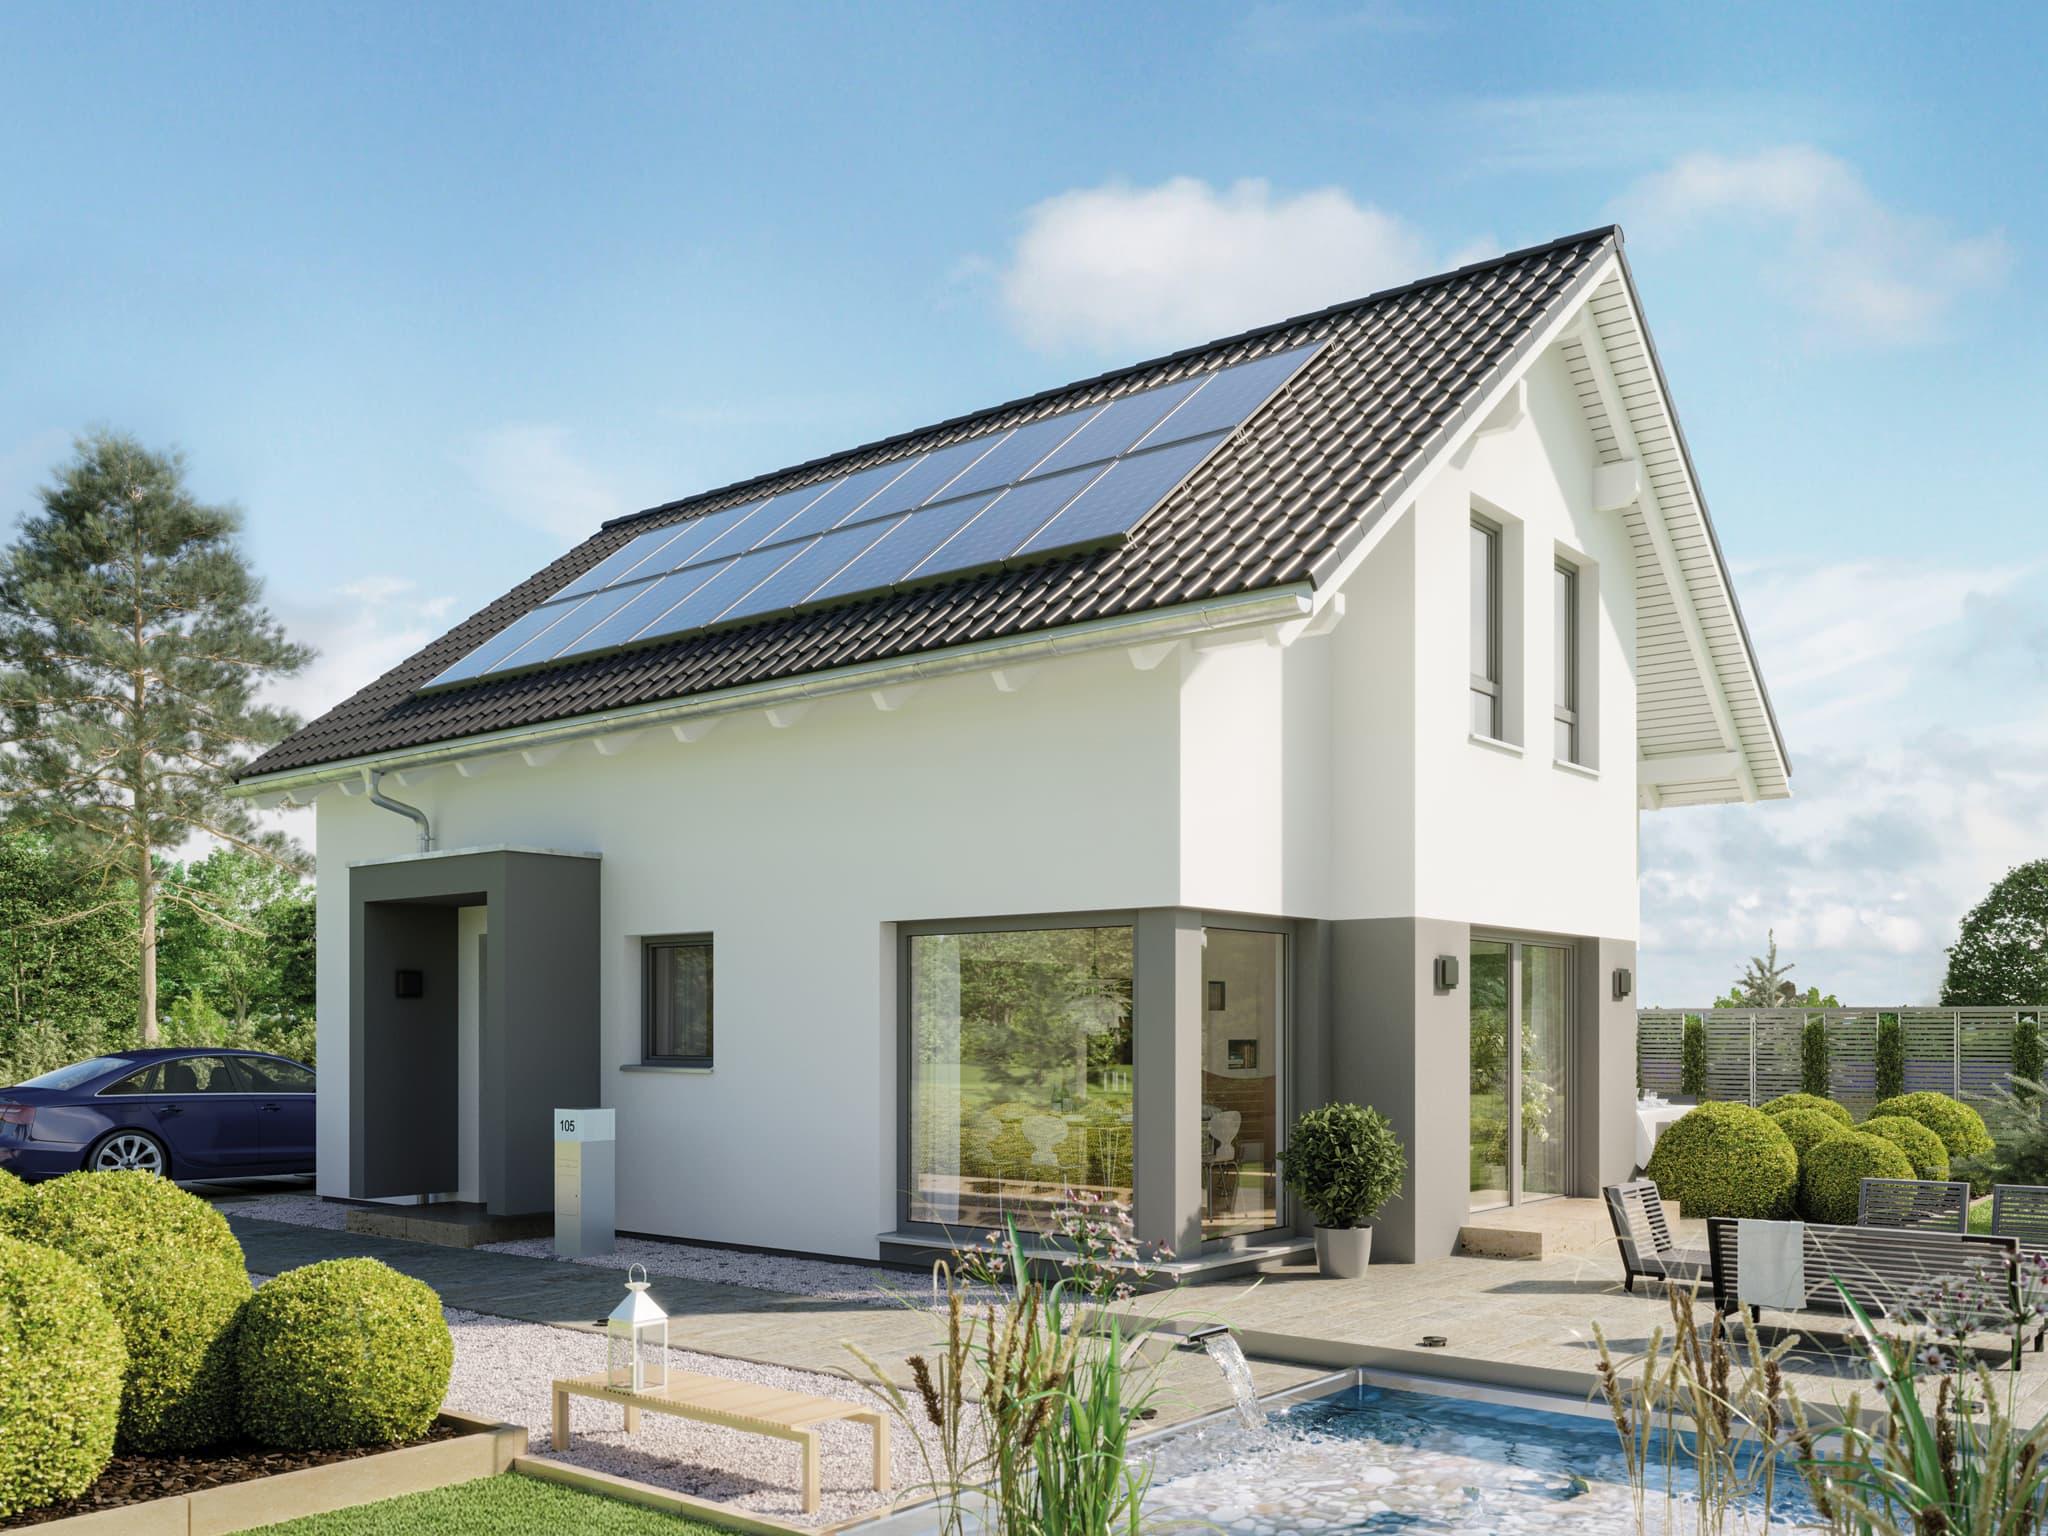 Einfamilienhaus Neubau modern mit Satteldach & Giebel-Erker, 5 Zimmer, 120 qm - Haus bauen Ideen Bien Zenker Fertighaus EDITION 123 V2 - HausbauDirekt.de